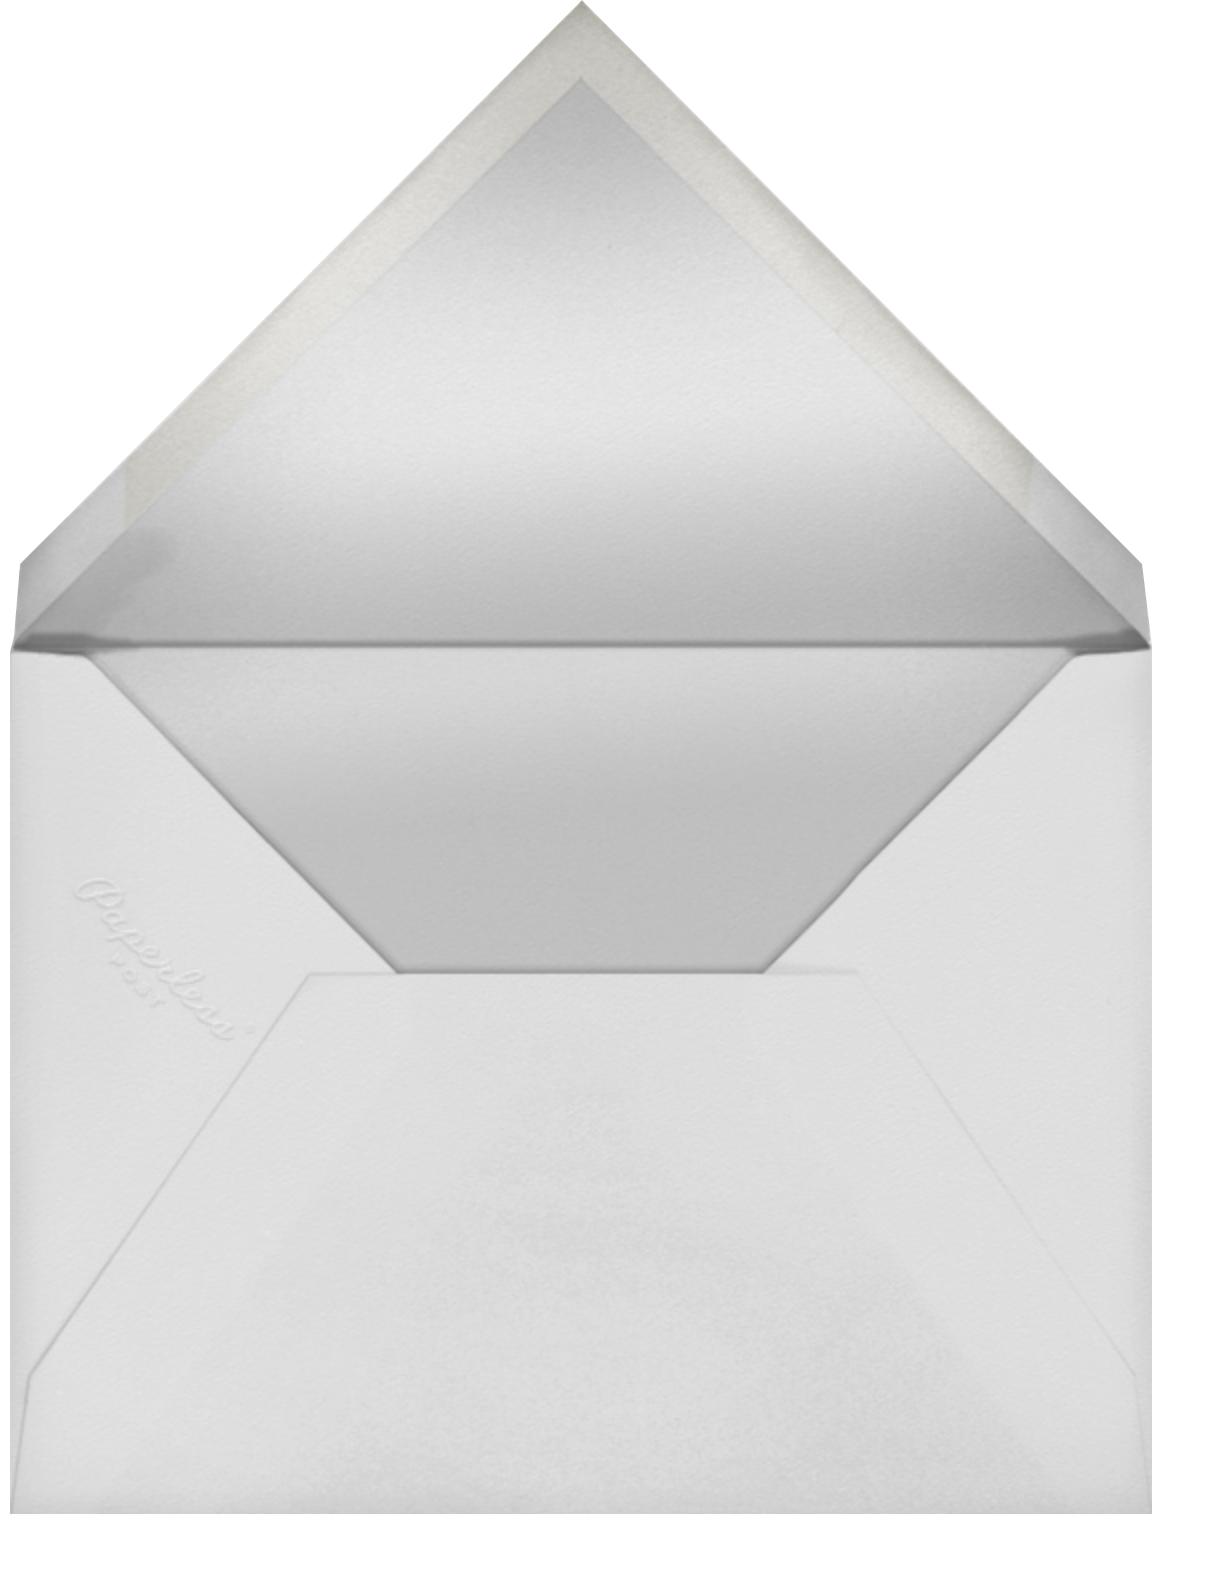 Gradient Full - Black - Paperless Post - Adult birthday - envelope back